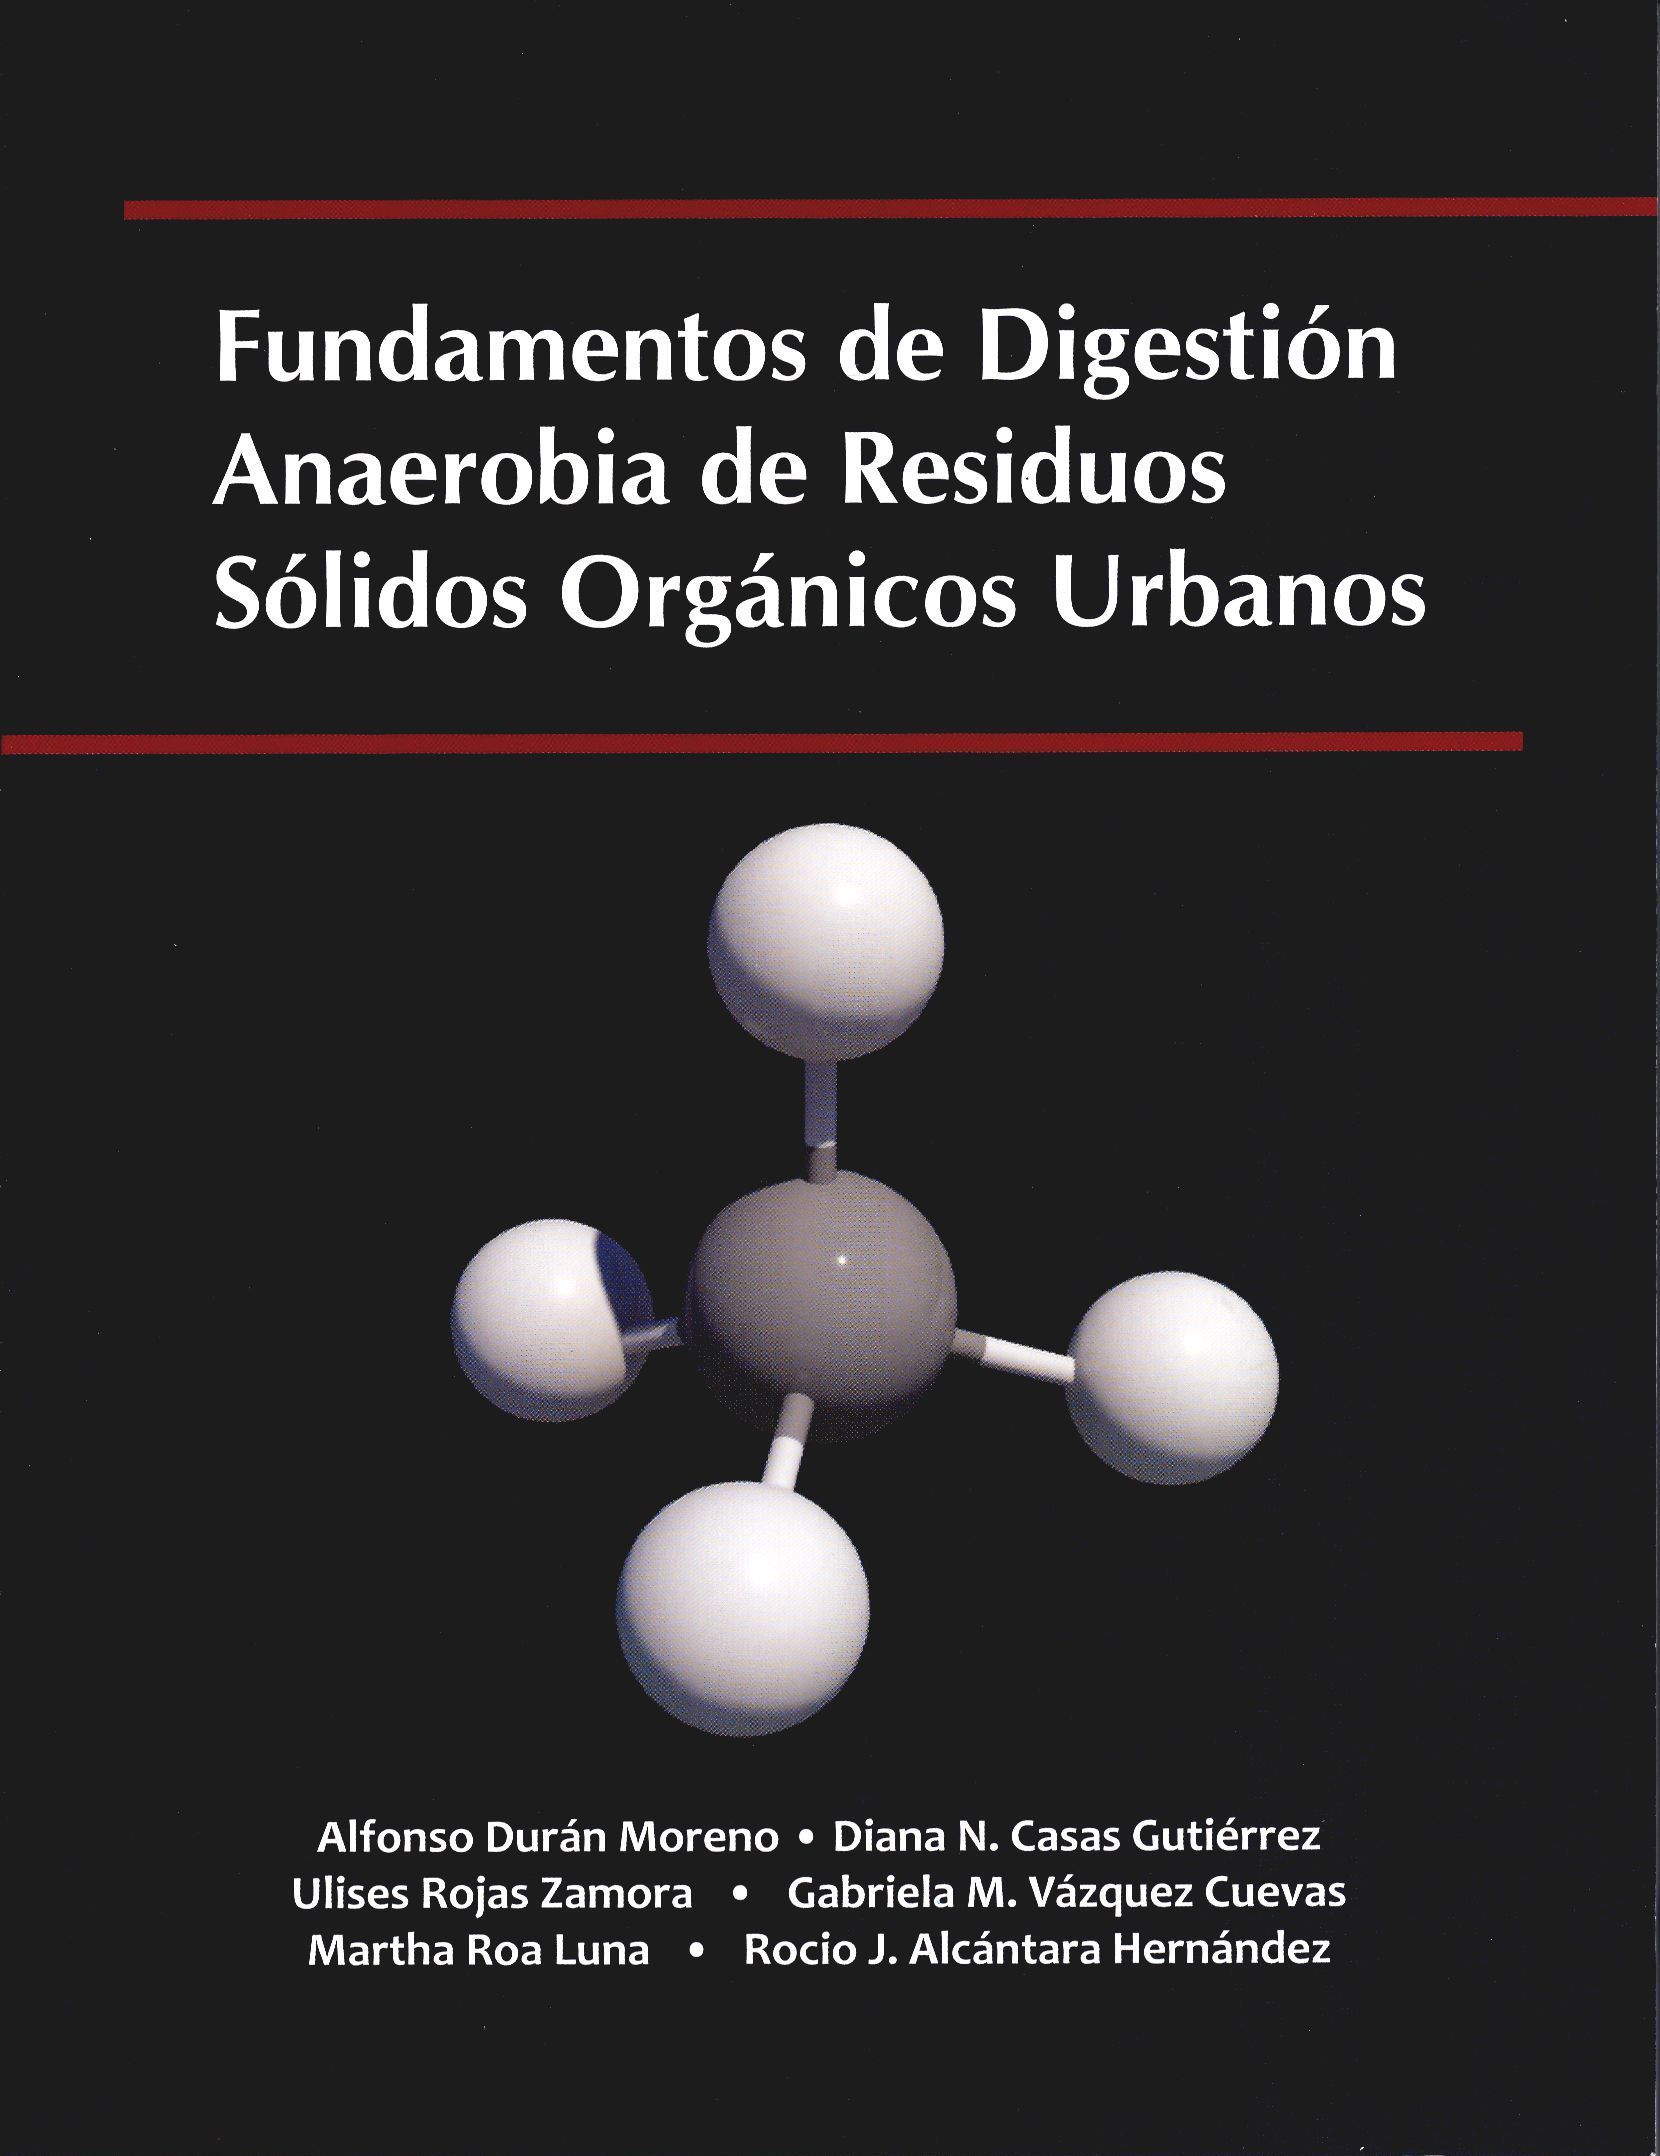 Fundamentos de digestión anaerobia de residuos sólidos orgánicos urbanos